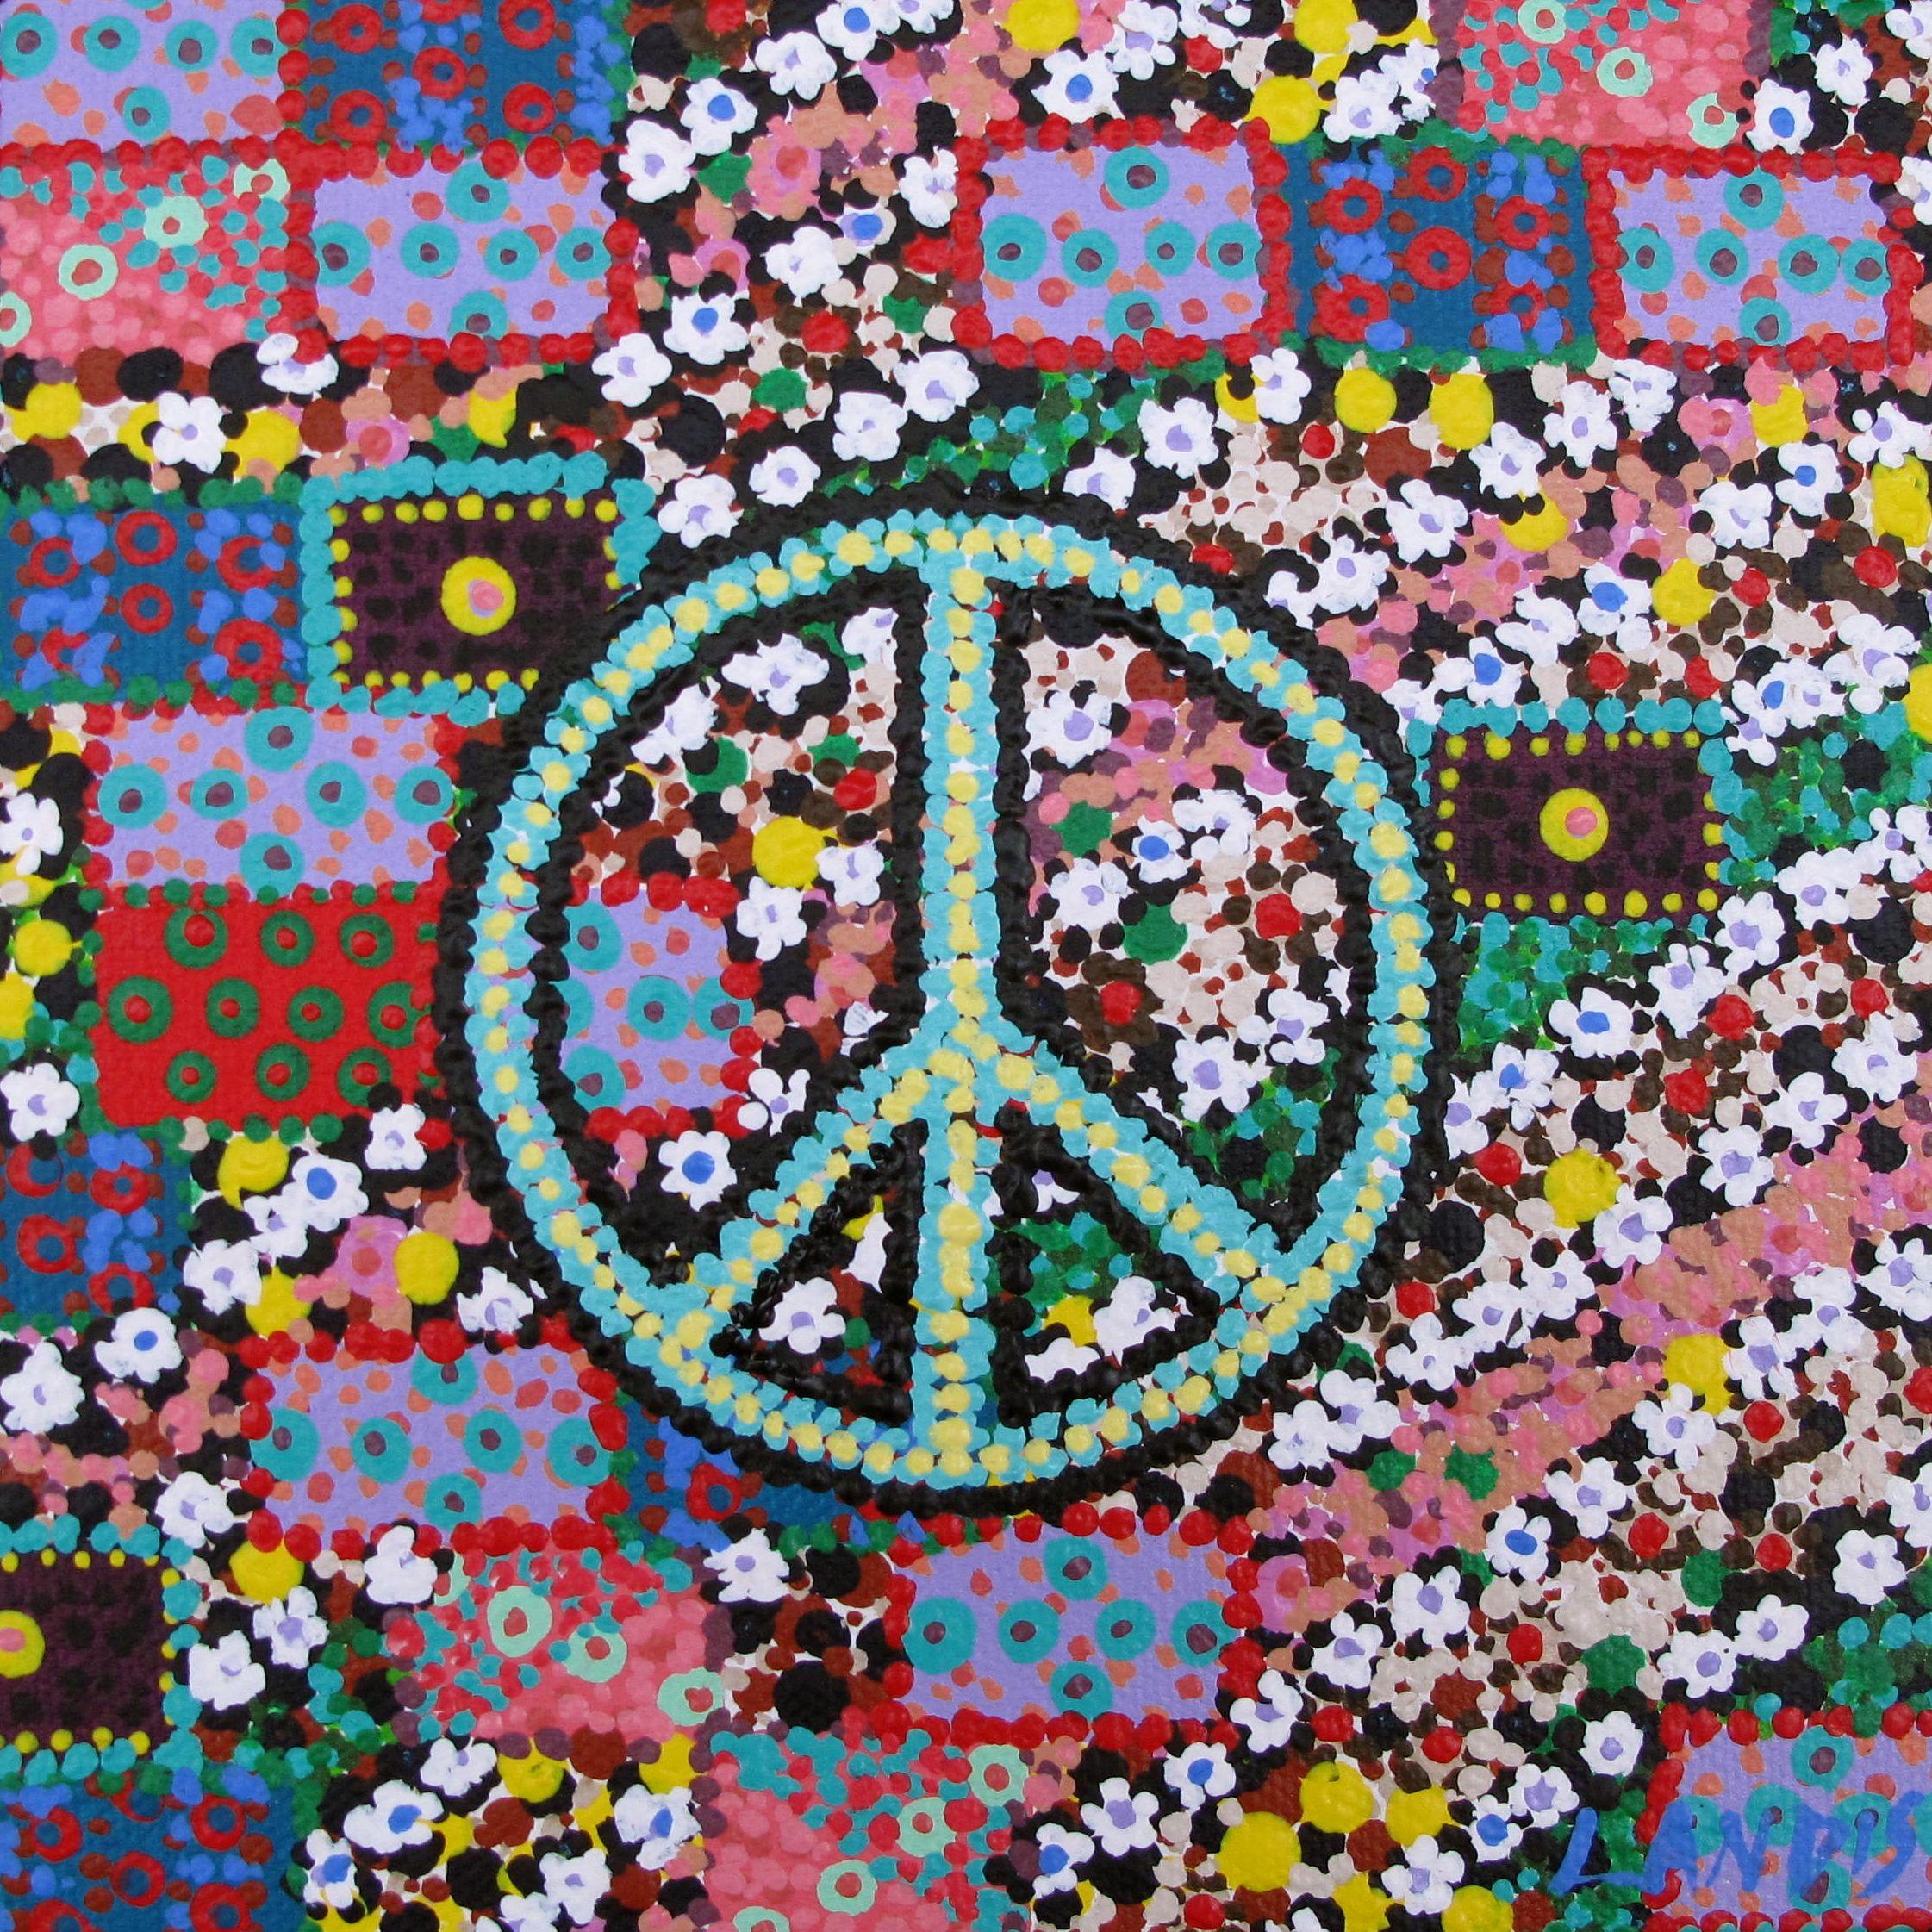 Love flower power daisy graffiti print cotton fabric 60s 70s retro - Flower Power At Charmingwall